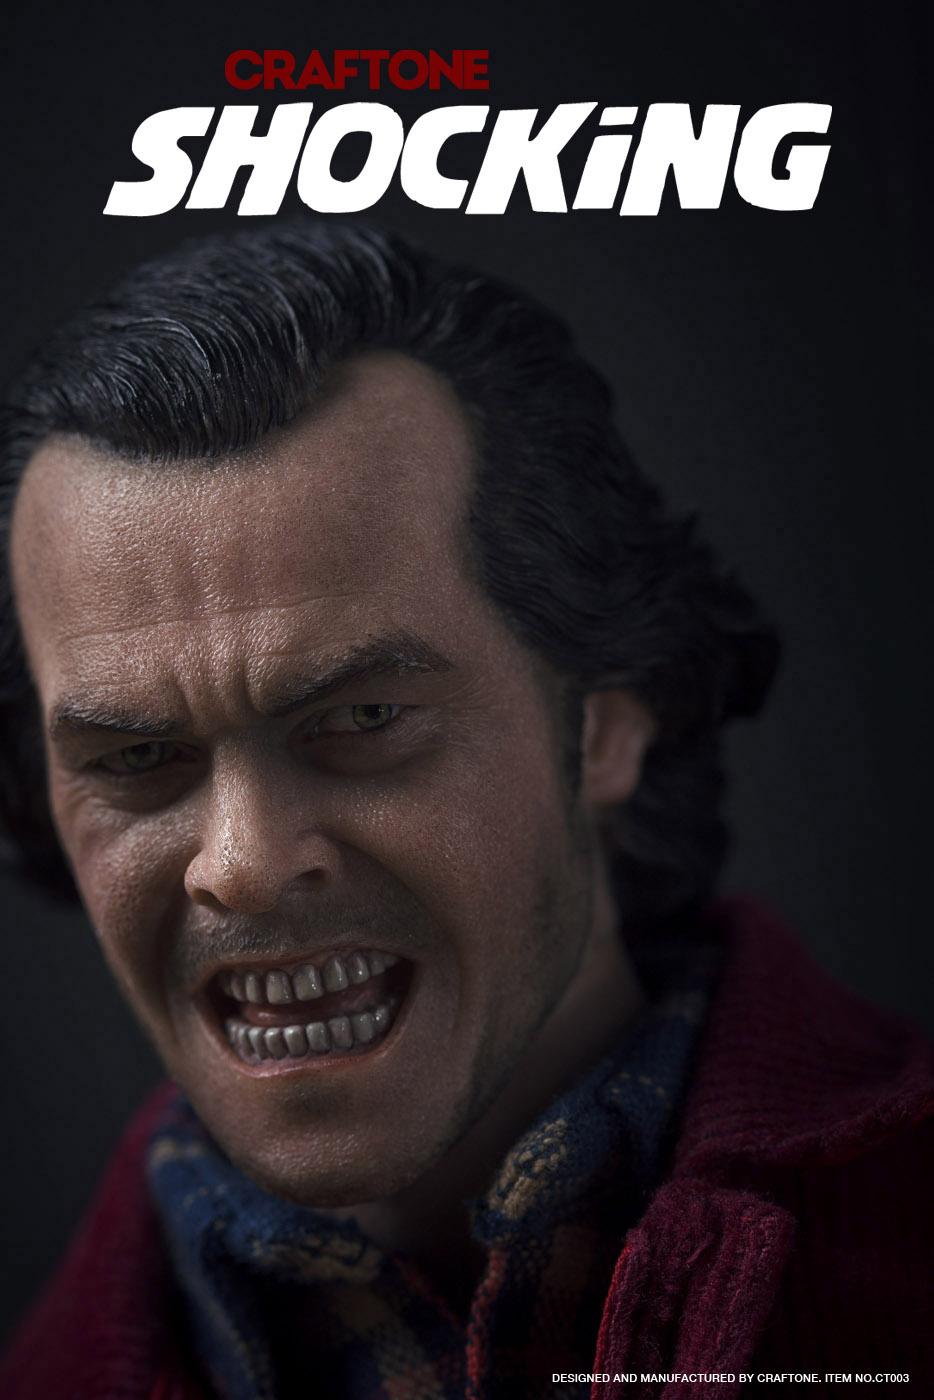 [Craftone] Shocking - Jack Torrance 1/6 scale 183853q1jldmudswahwf3s